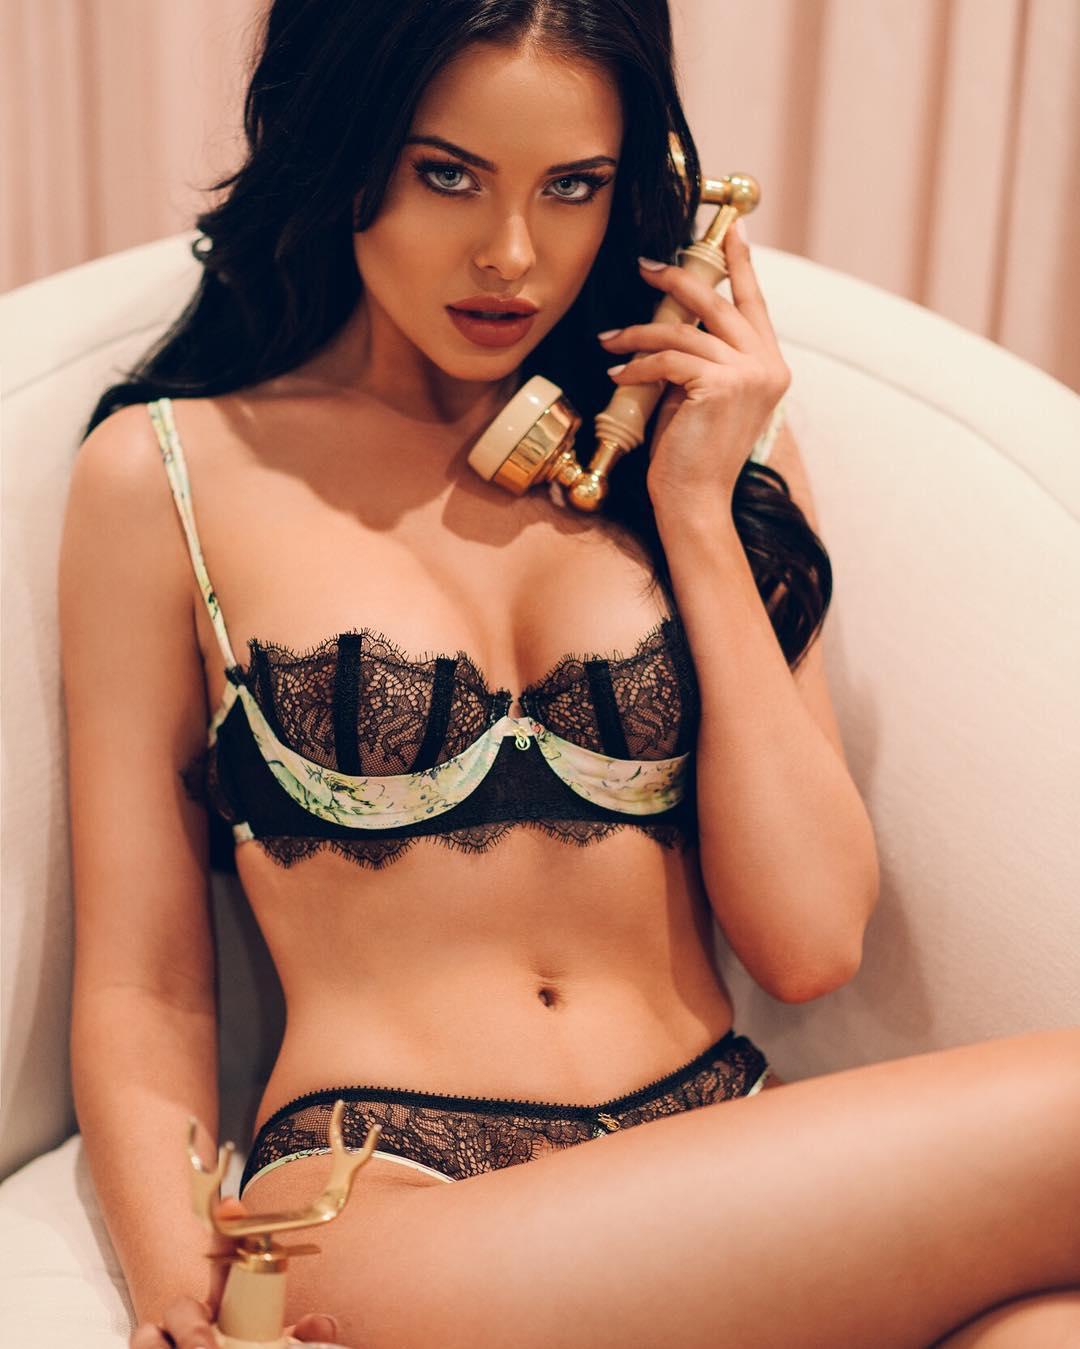 Watch Mara teigen lingerie video